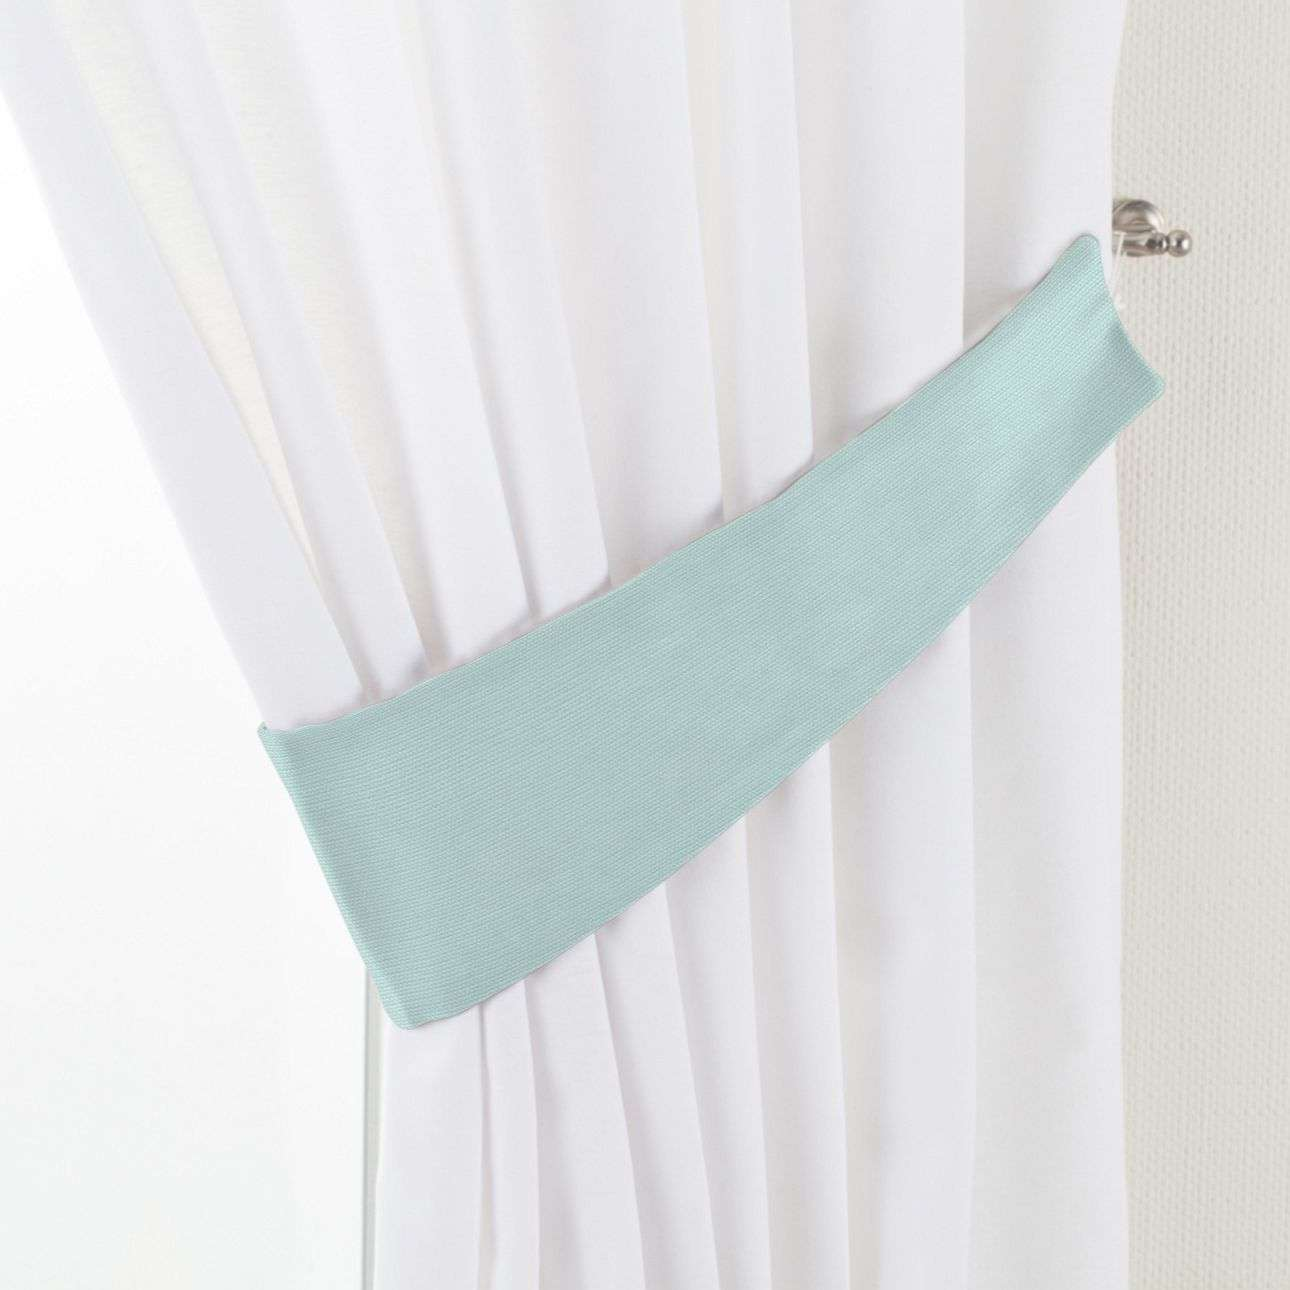 Úchyt Victoria, 1ks V kolekcii Cotton Panama, tkanina: 702-10